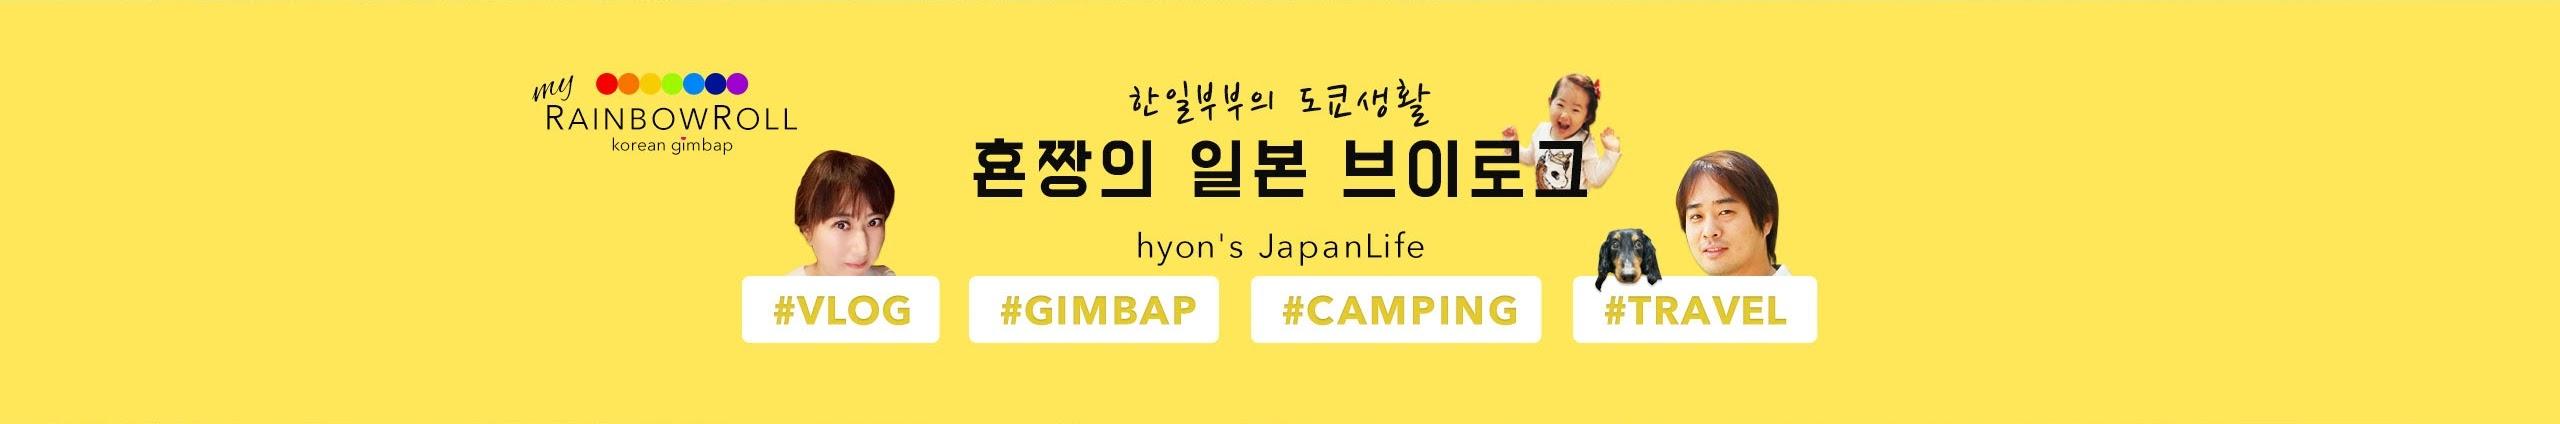 hyon vlog japan life 일본 Tokyo에 사는 육아맘의 일상 브이로그